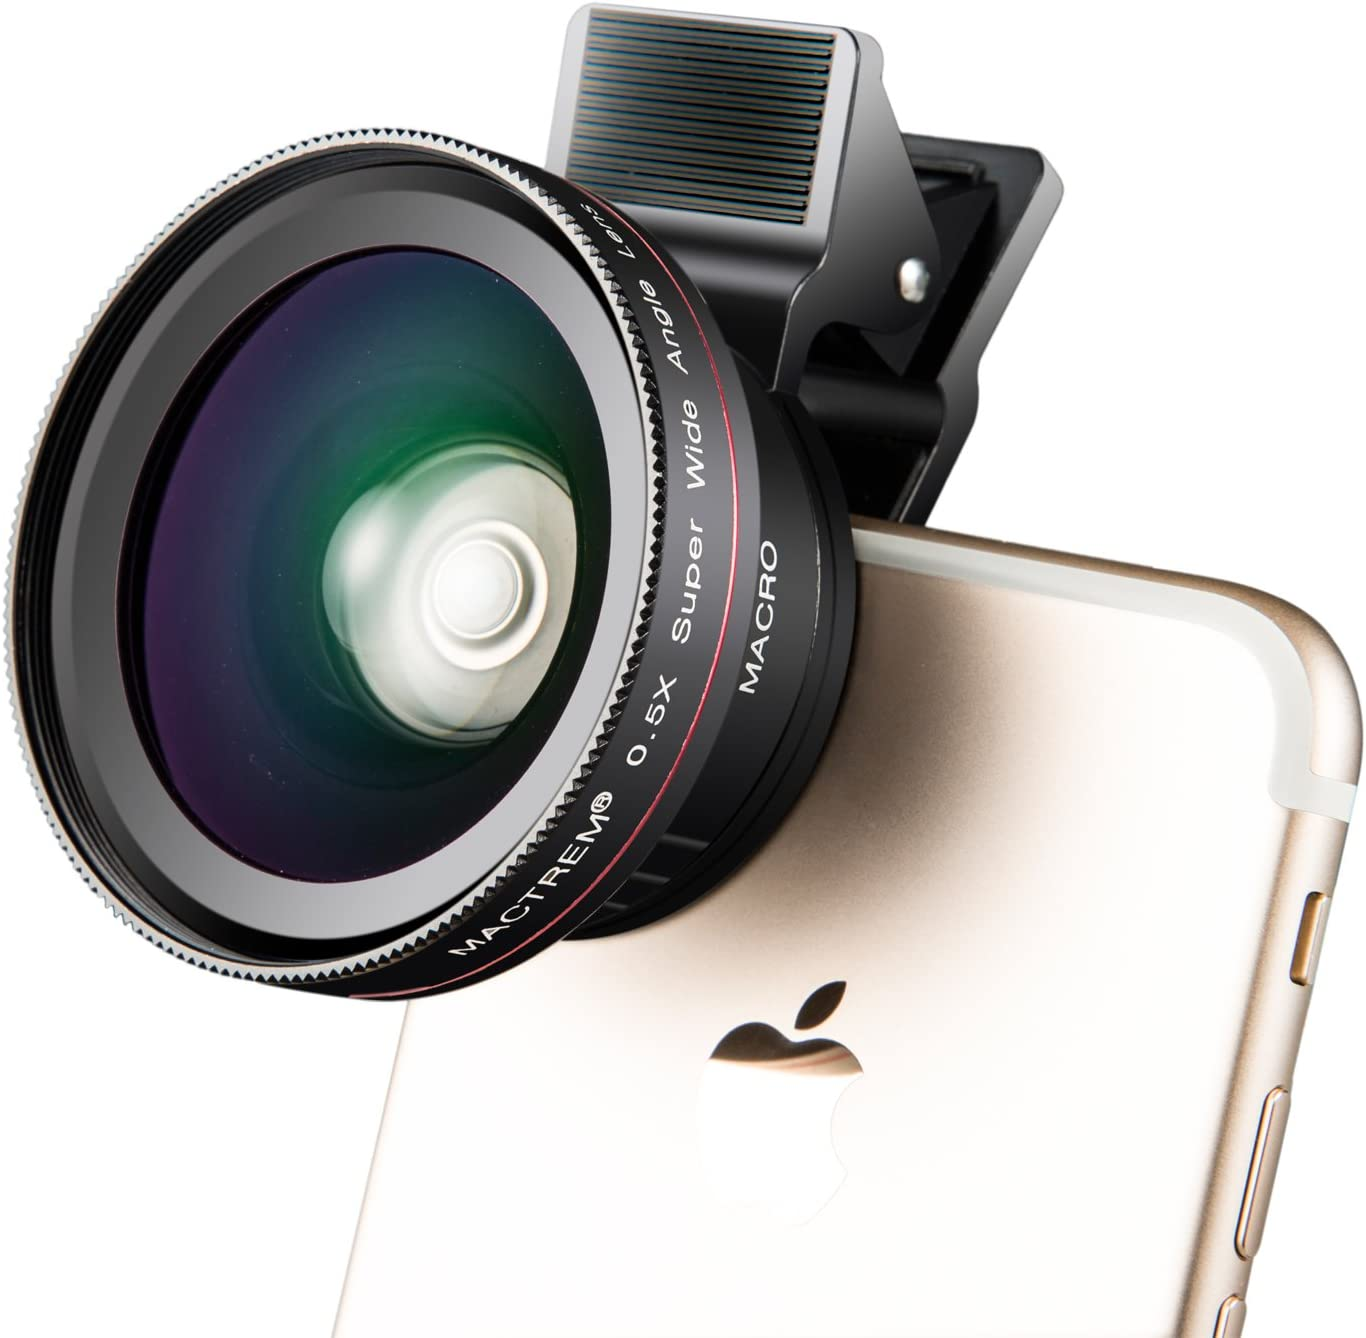 Kit de lente de cámara universal 2 en 1 para Smartphone, estilo ...